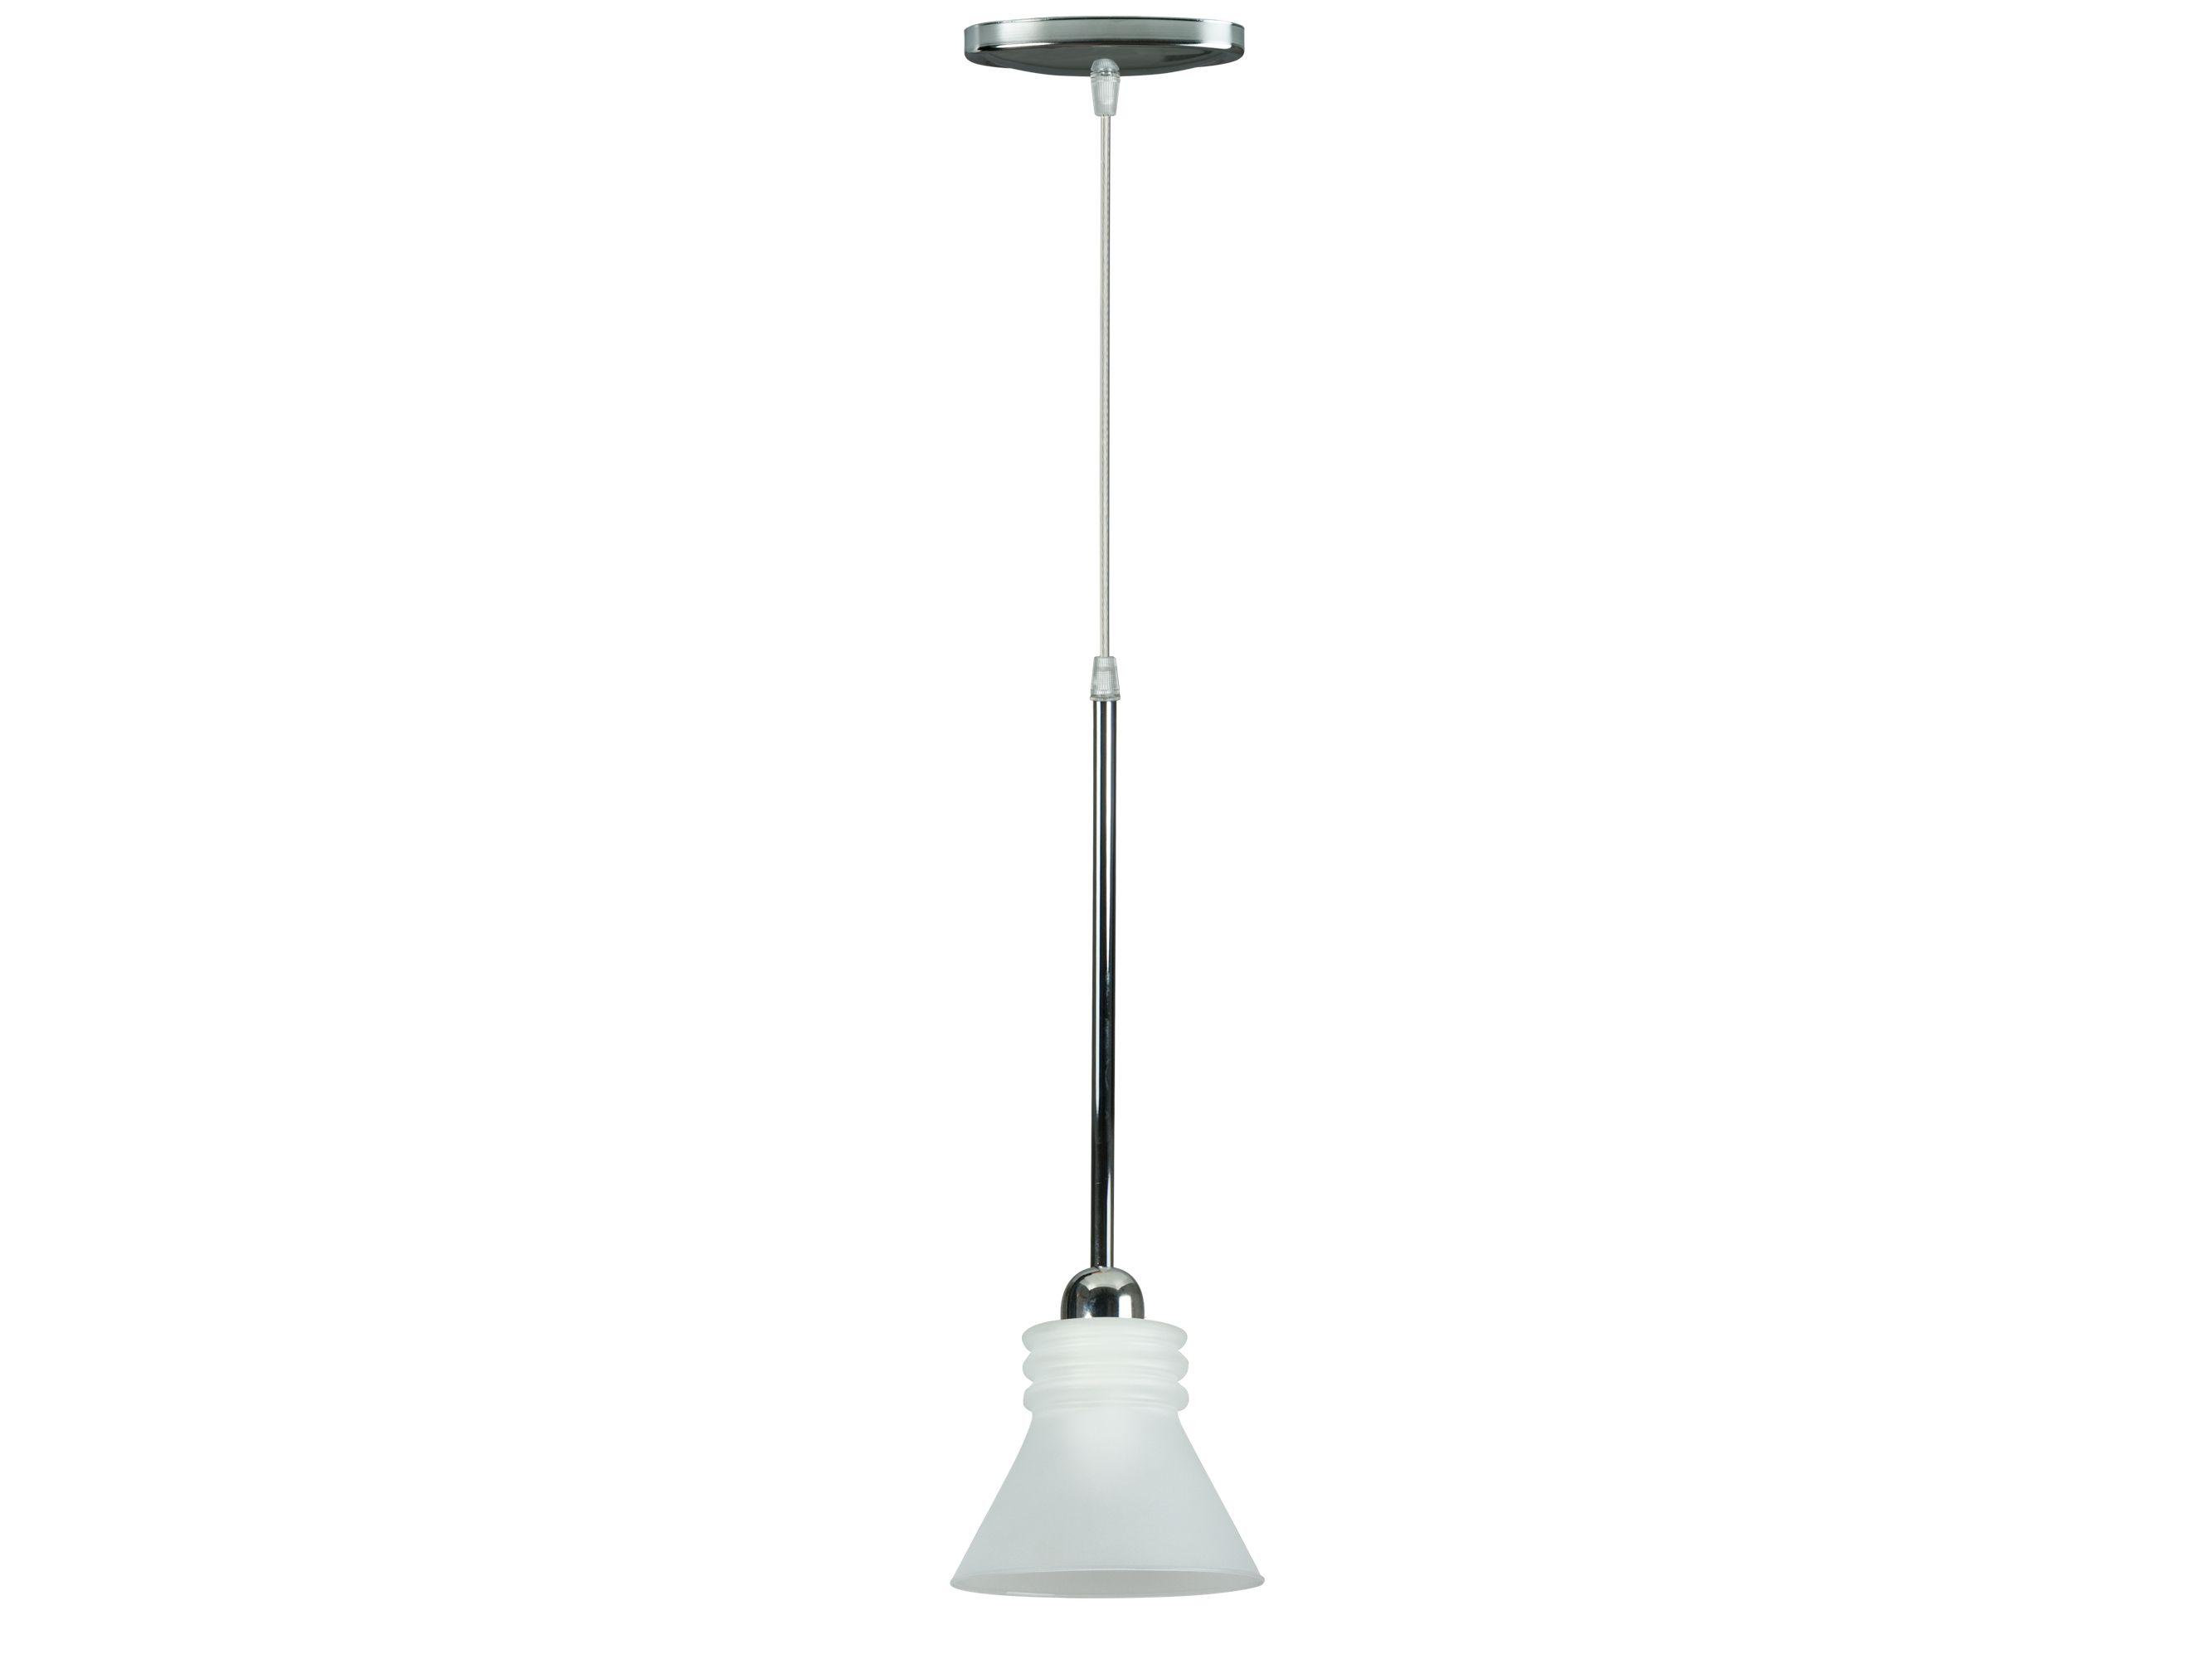 saureo-pendant-lamp-brossier-saderne-296015-rel3d7e3ce7 Elegantes Flos Glo Ball S Dekorationen